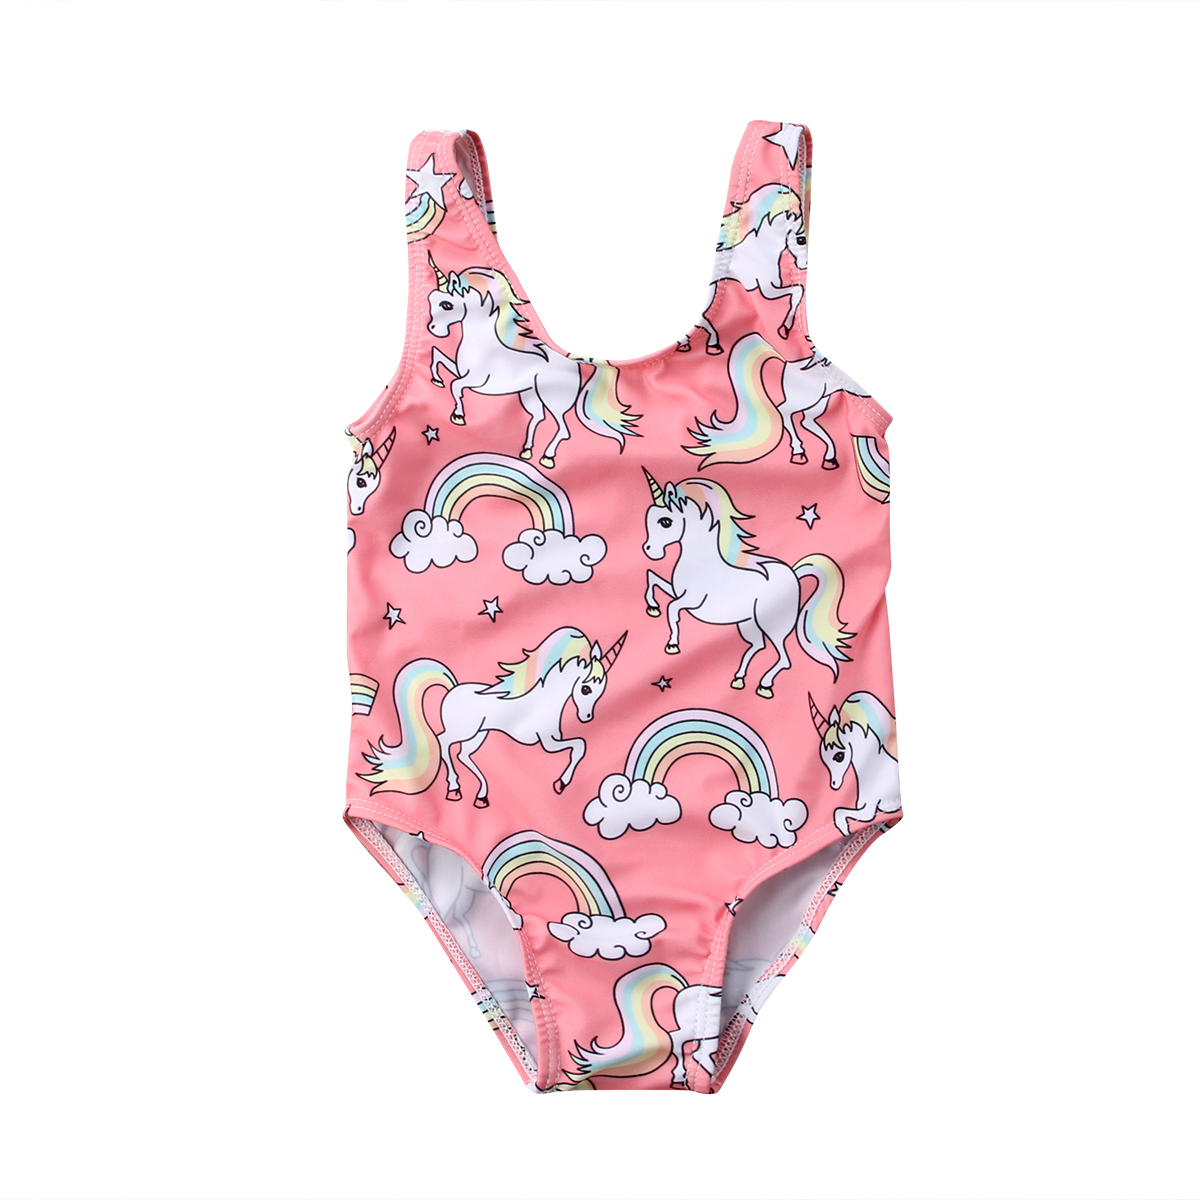 Lovely Summer Baby Bathing Suit 2018 Baby Girl Swimsuit Unicorn Swimwear Swimming Bikini Bathing Costume kids baby girls clothing black bikini suit set striped swimsuit swimwear bathing swimming clothes